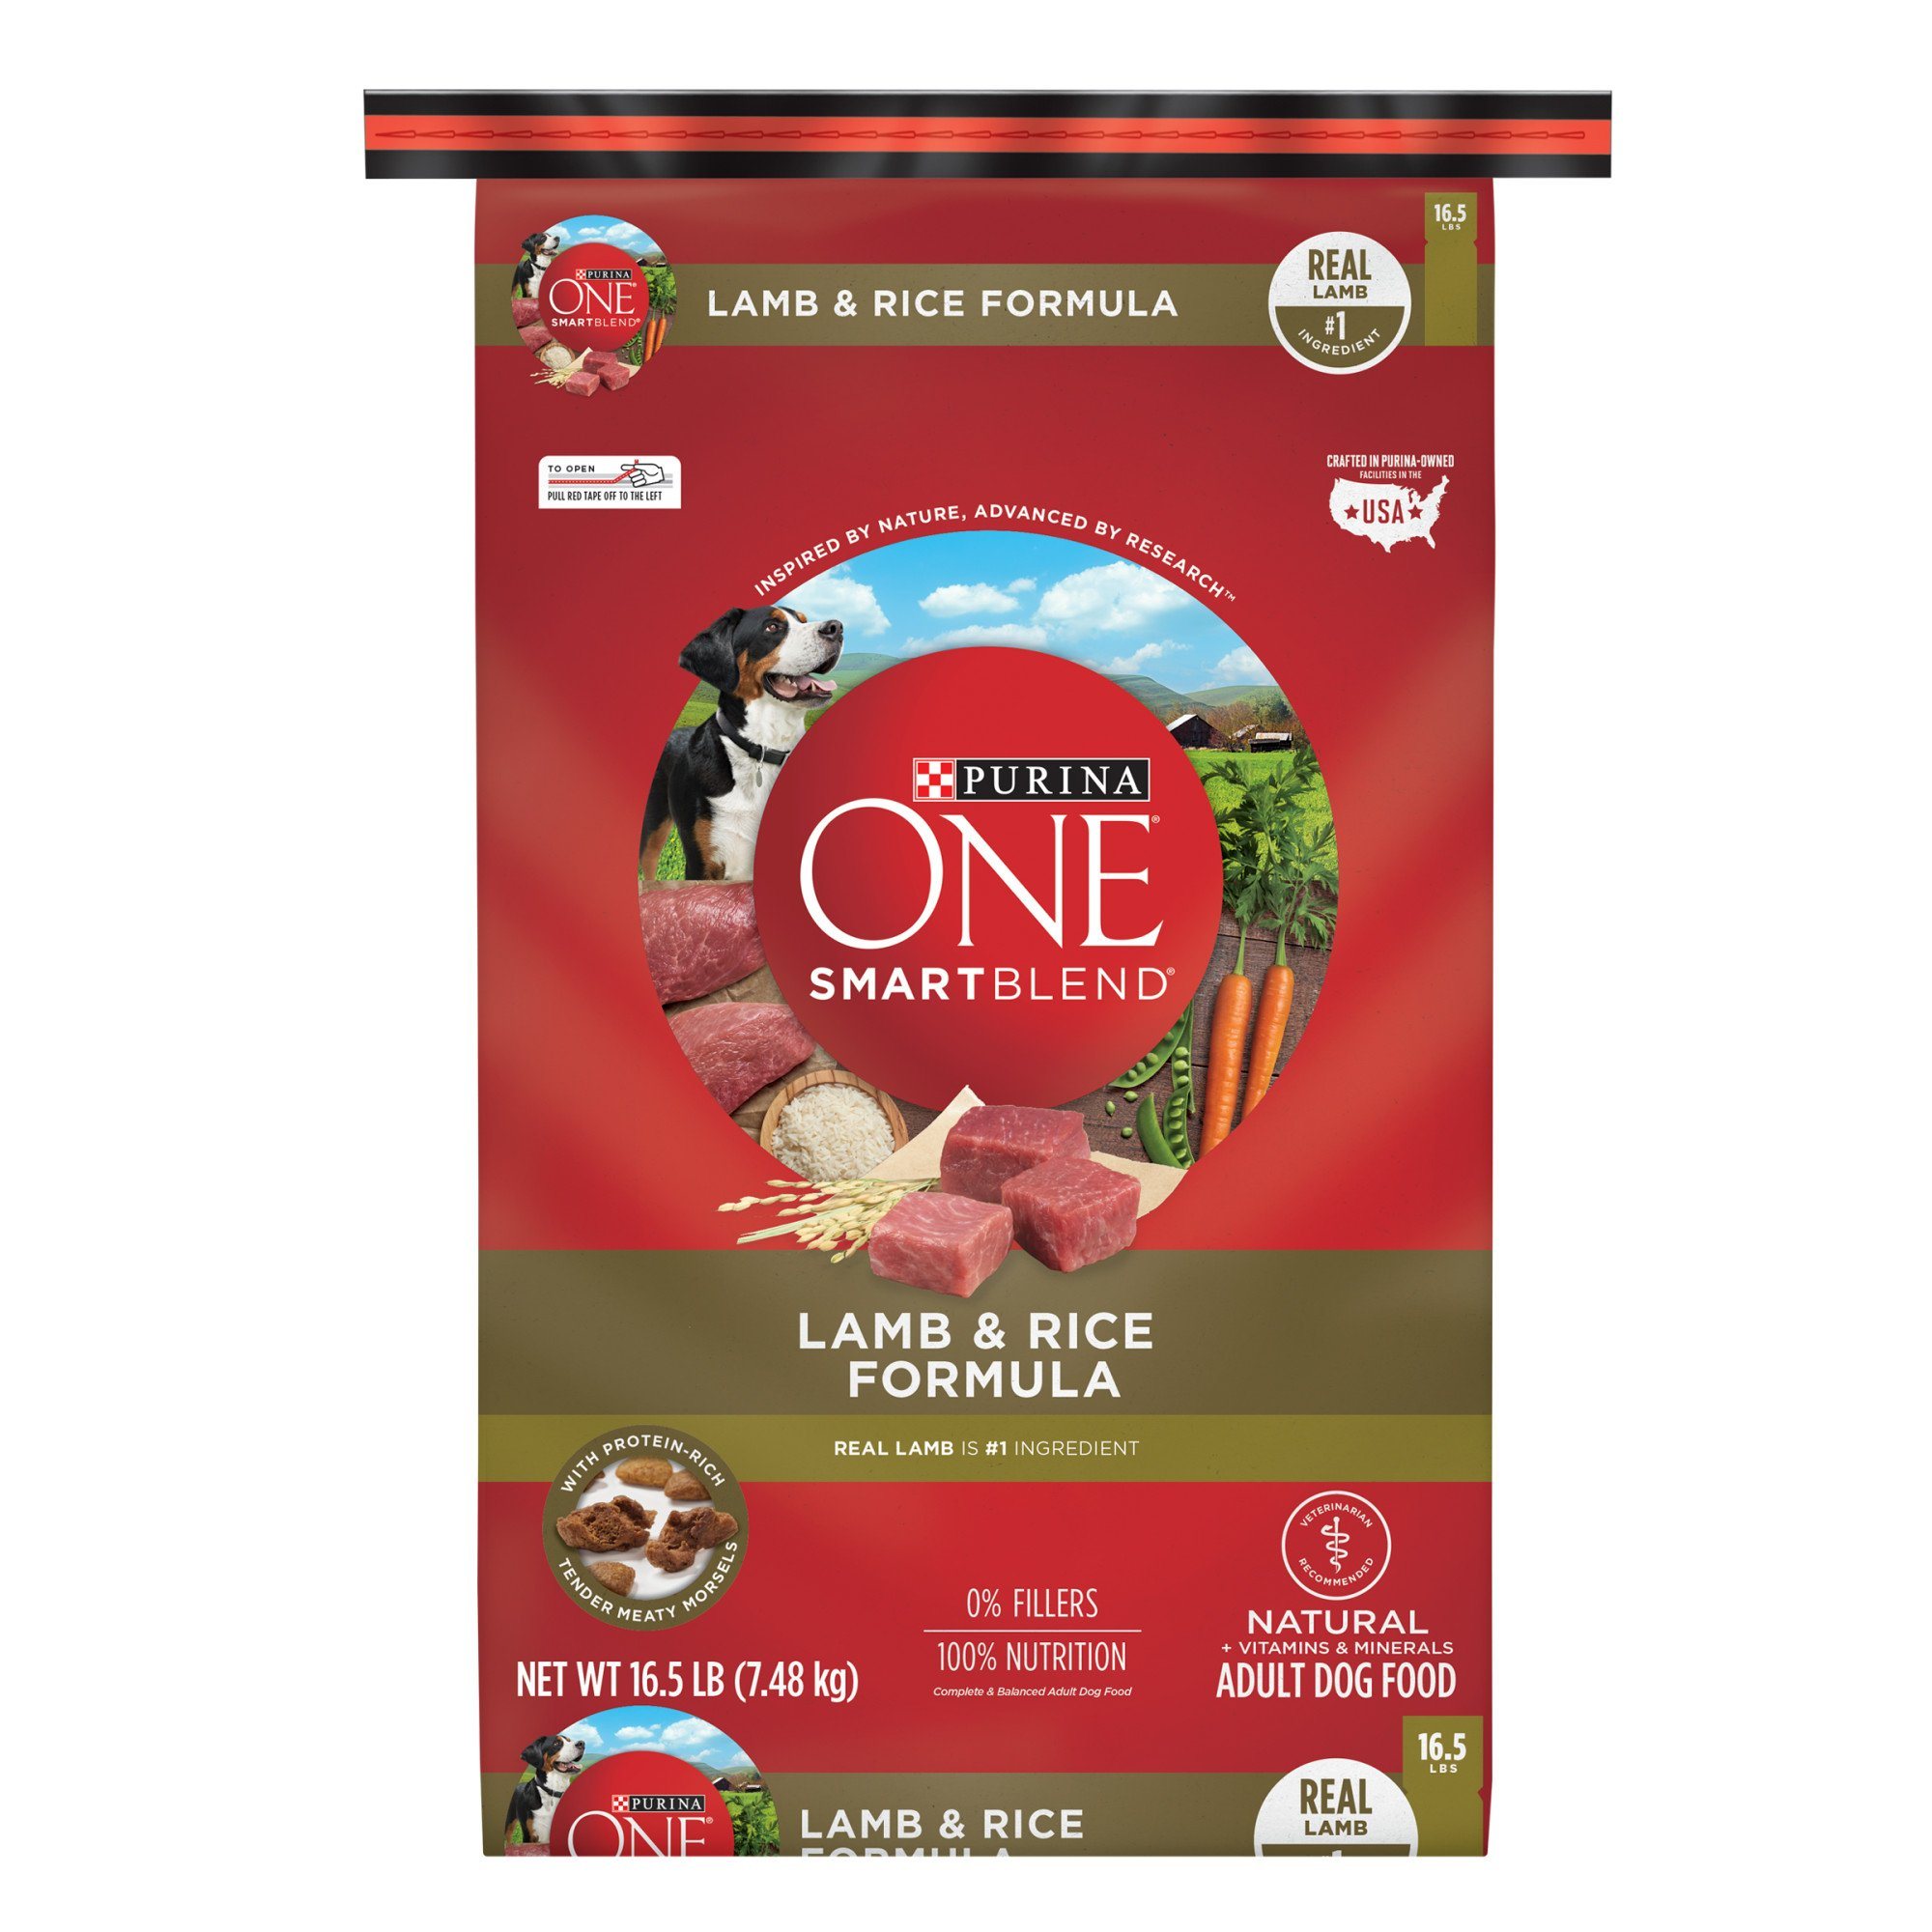 Purina ONE SmartBlend Lamb & Rice Formula Adult Premium